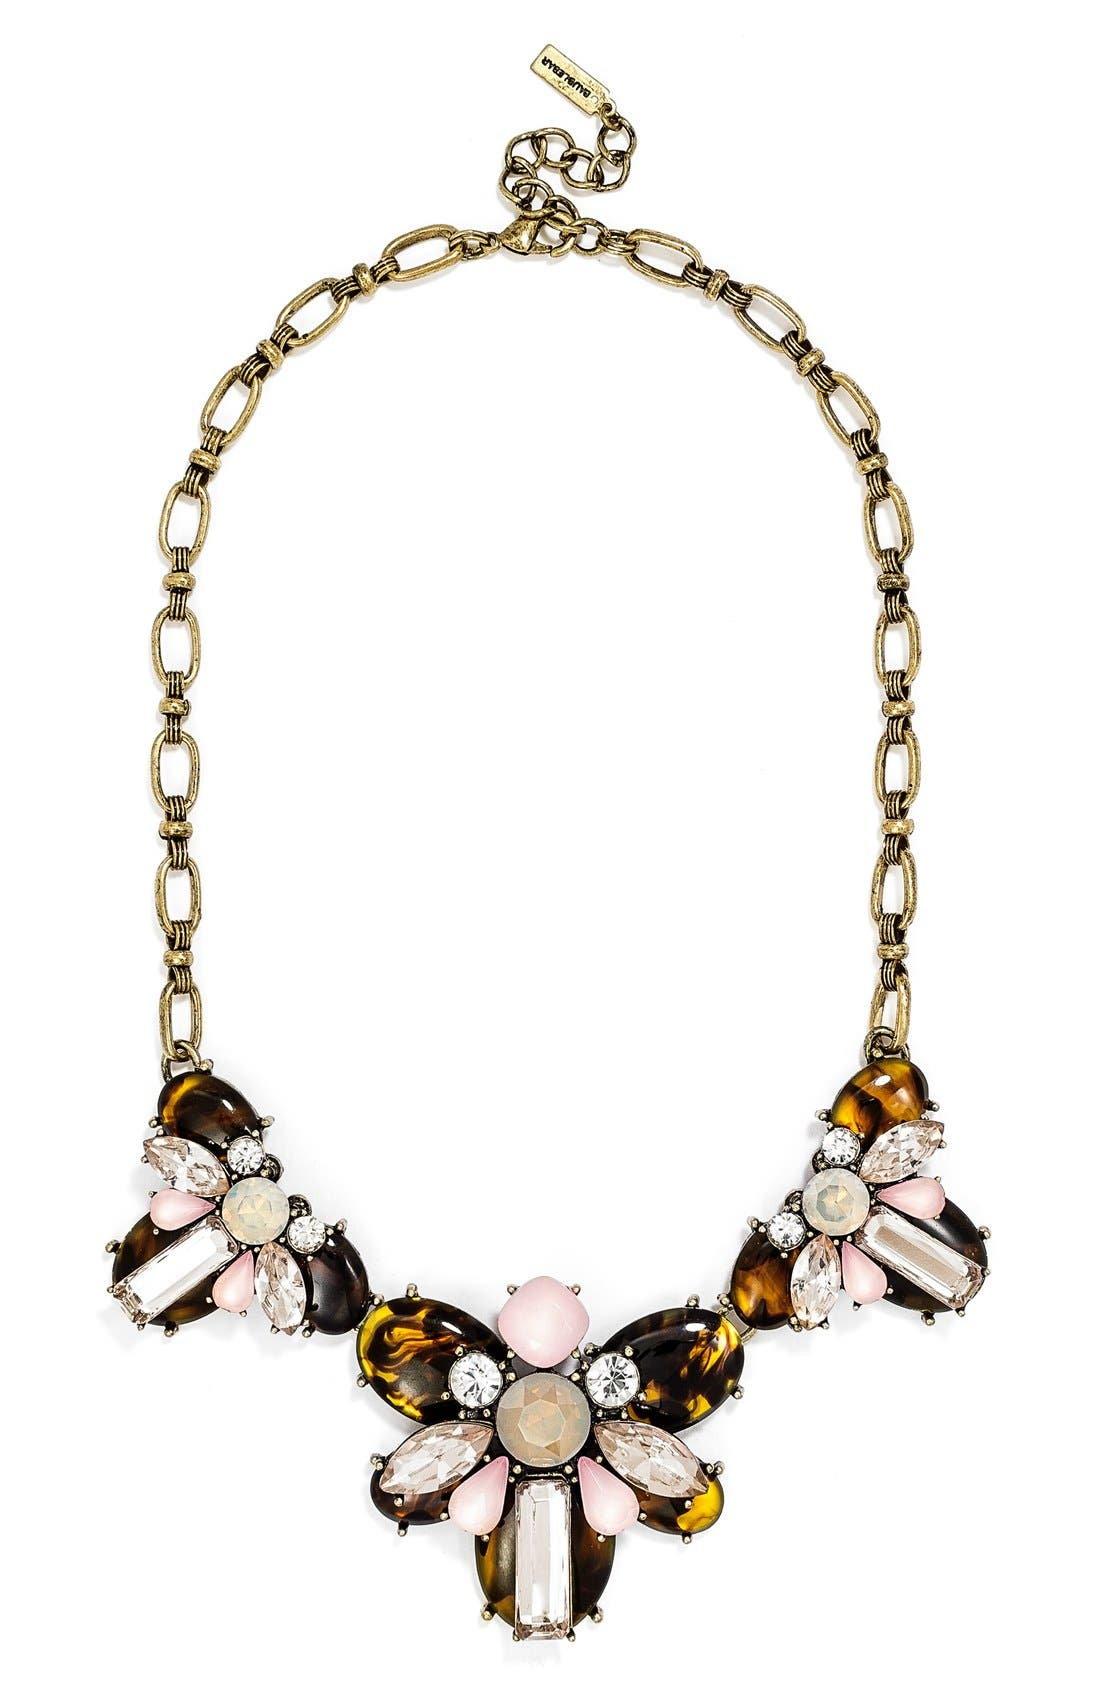 Main Image - BaubleBar 'Bliss' Bib Necklace